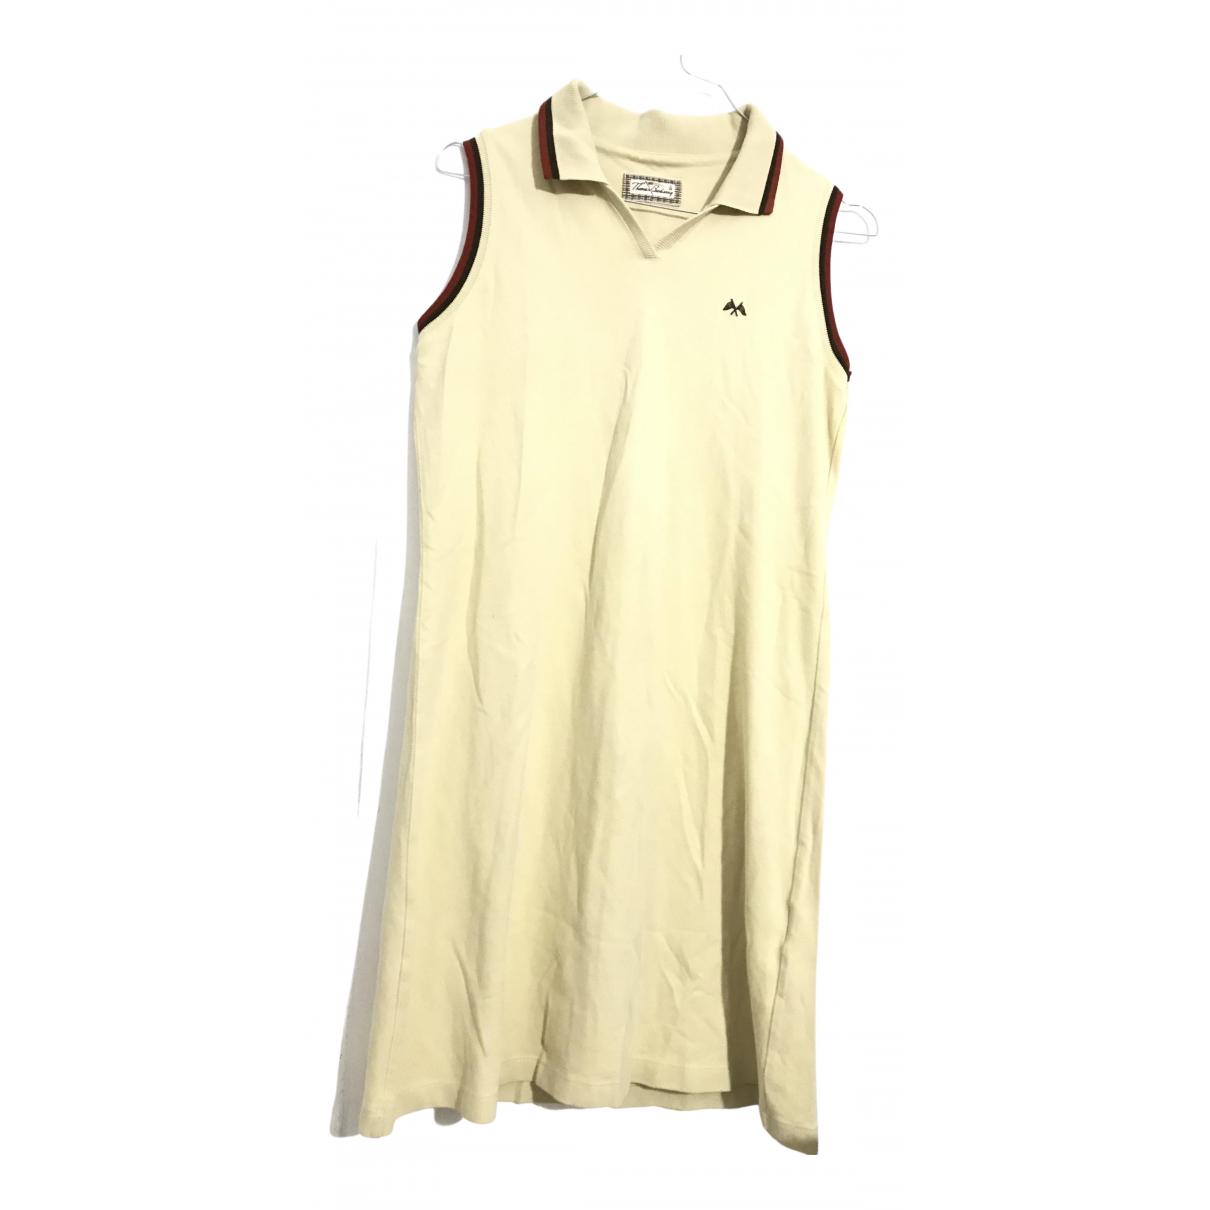 Burberry N Beige Cotton dress for Women S International